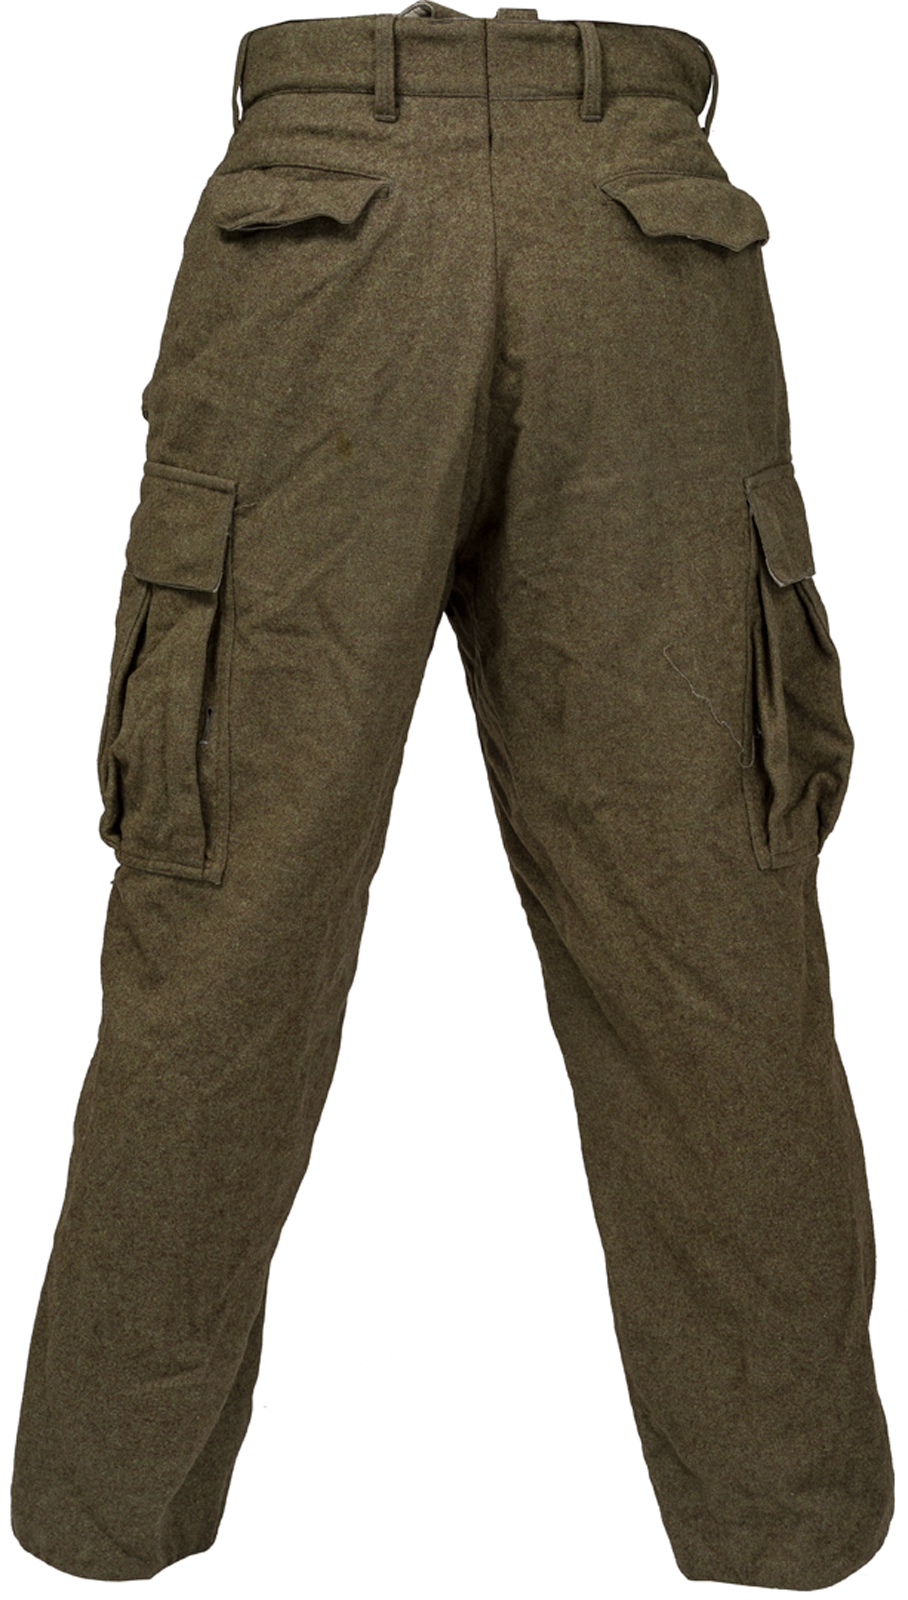 Favoloso Pantaloni Mimetici Uomo Stretti KI72 » Regardsdefemmes XH26